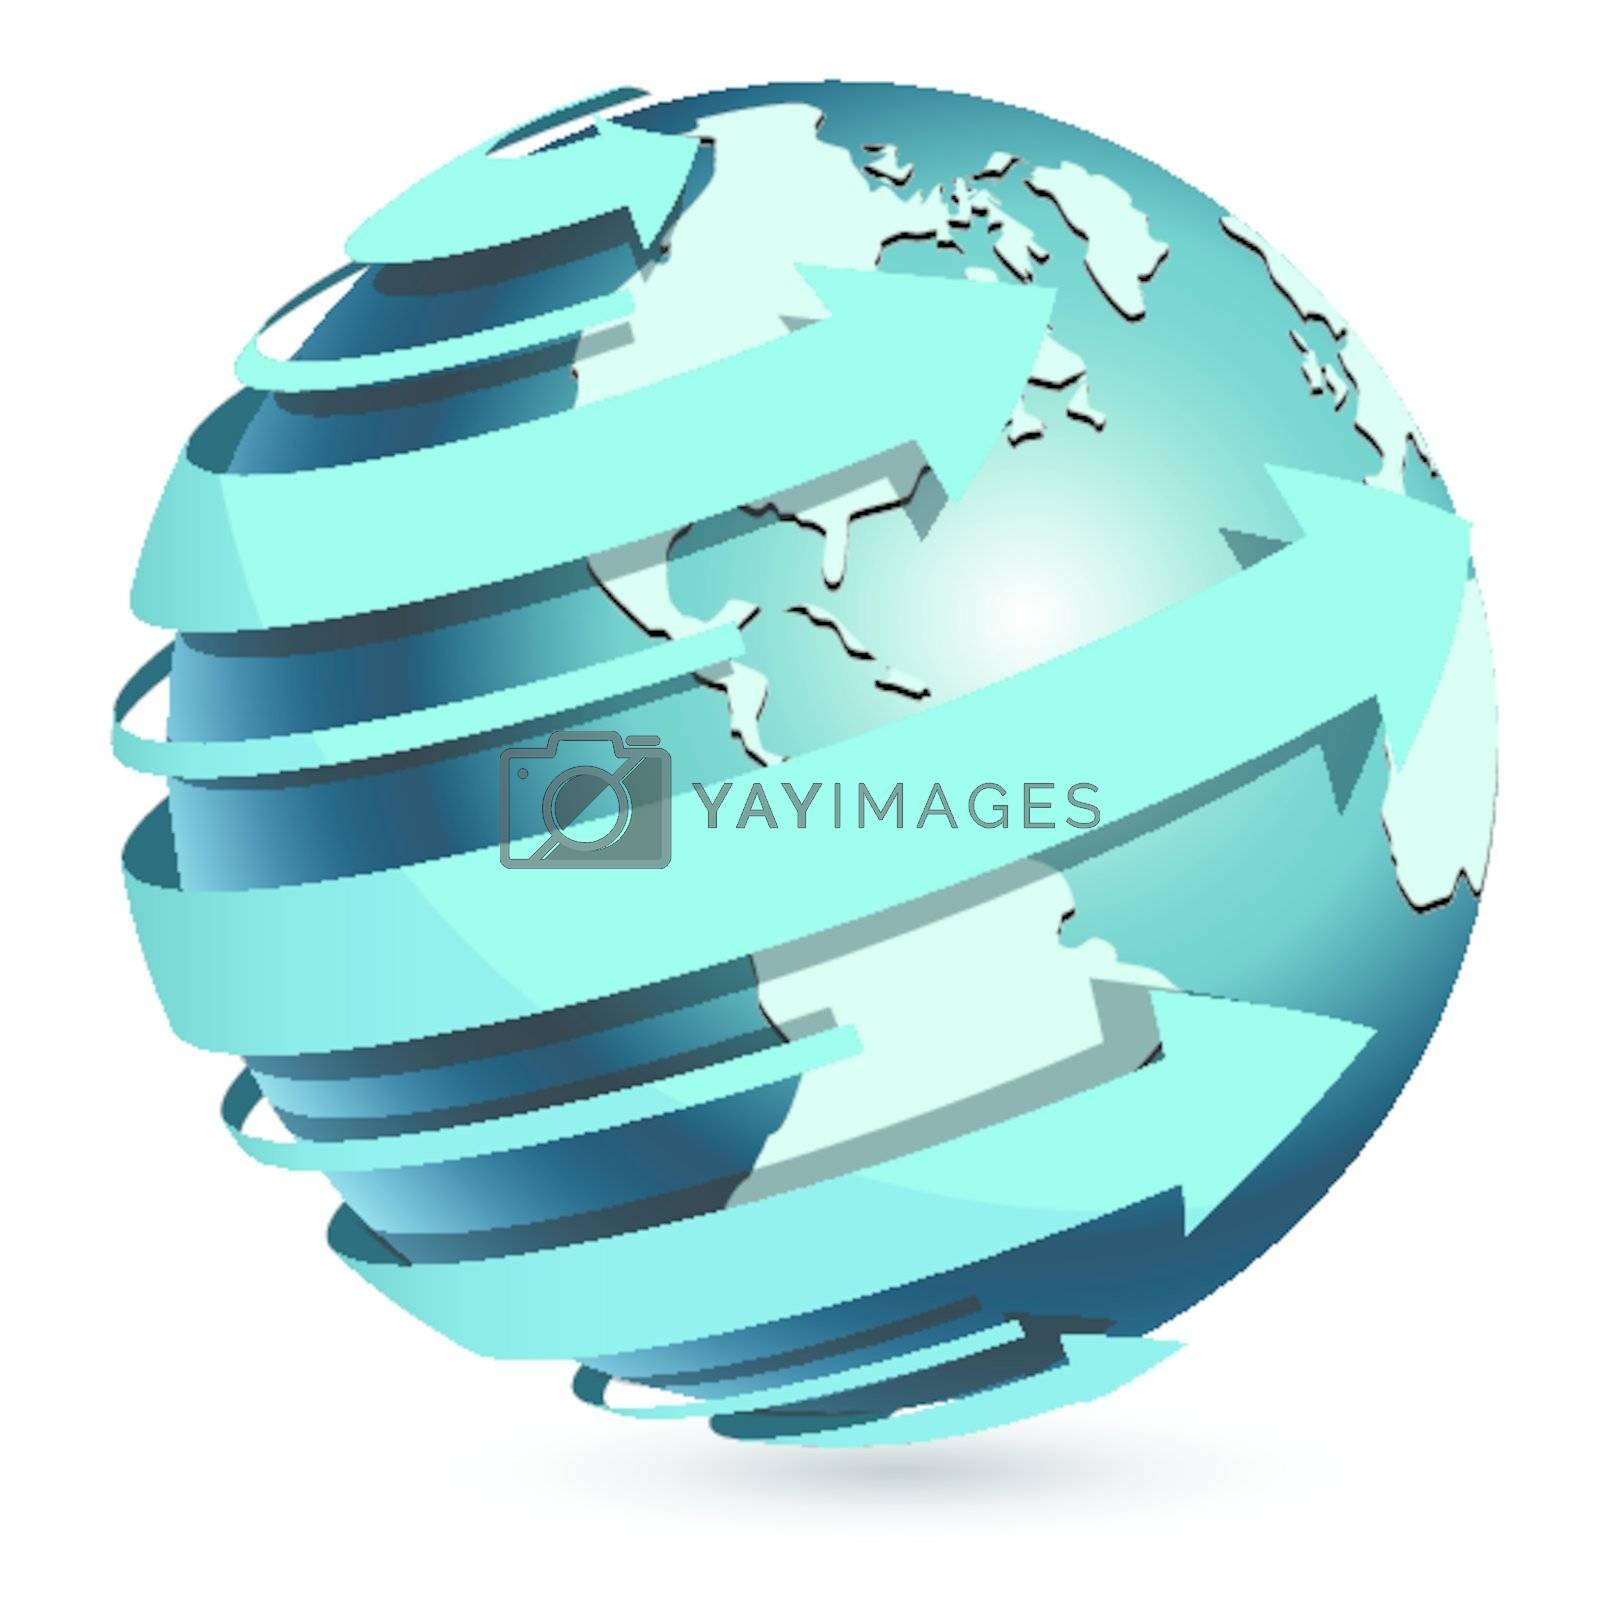 Illustration, transparent blue globe on white-blue background